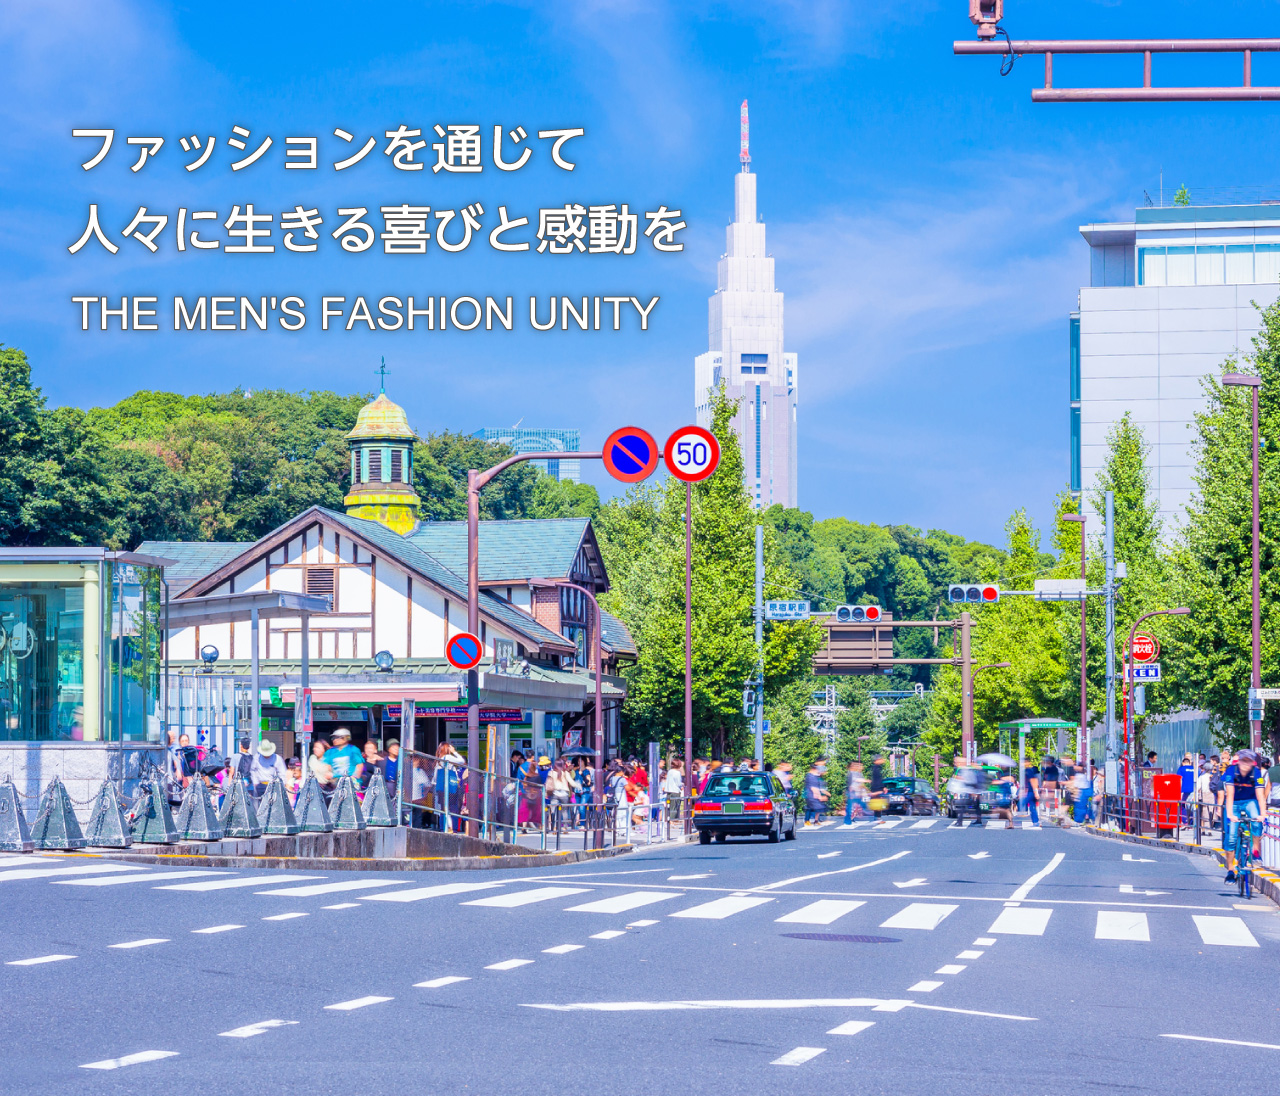 MFU 一般社団法人日本メンズファッション協会